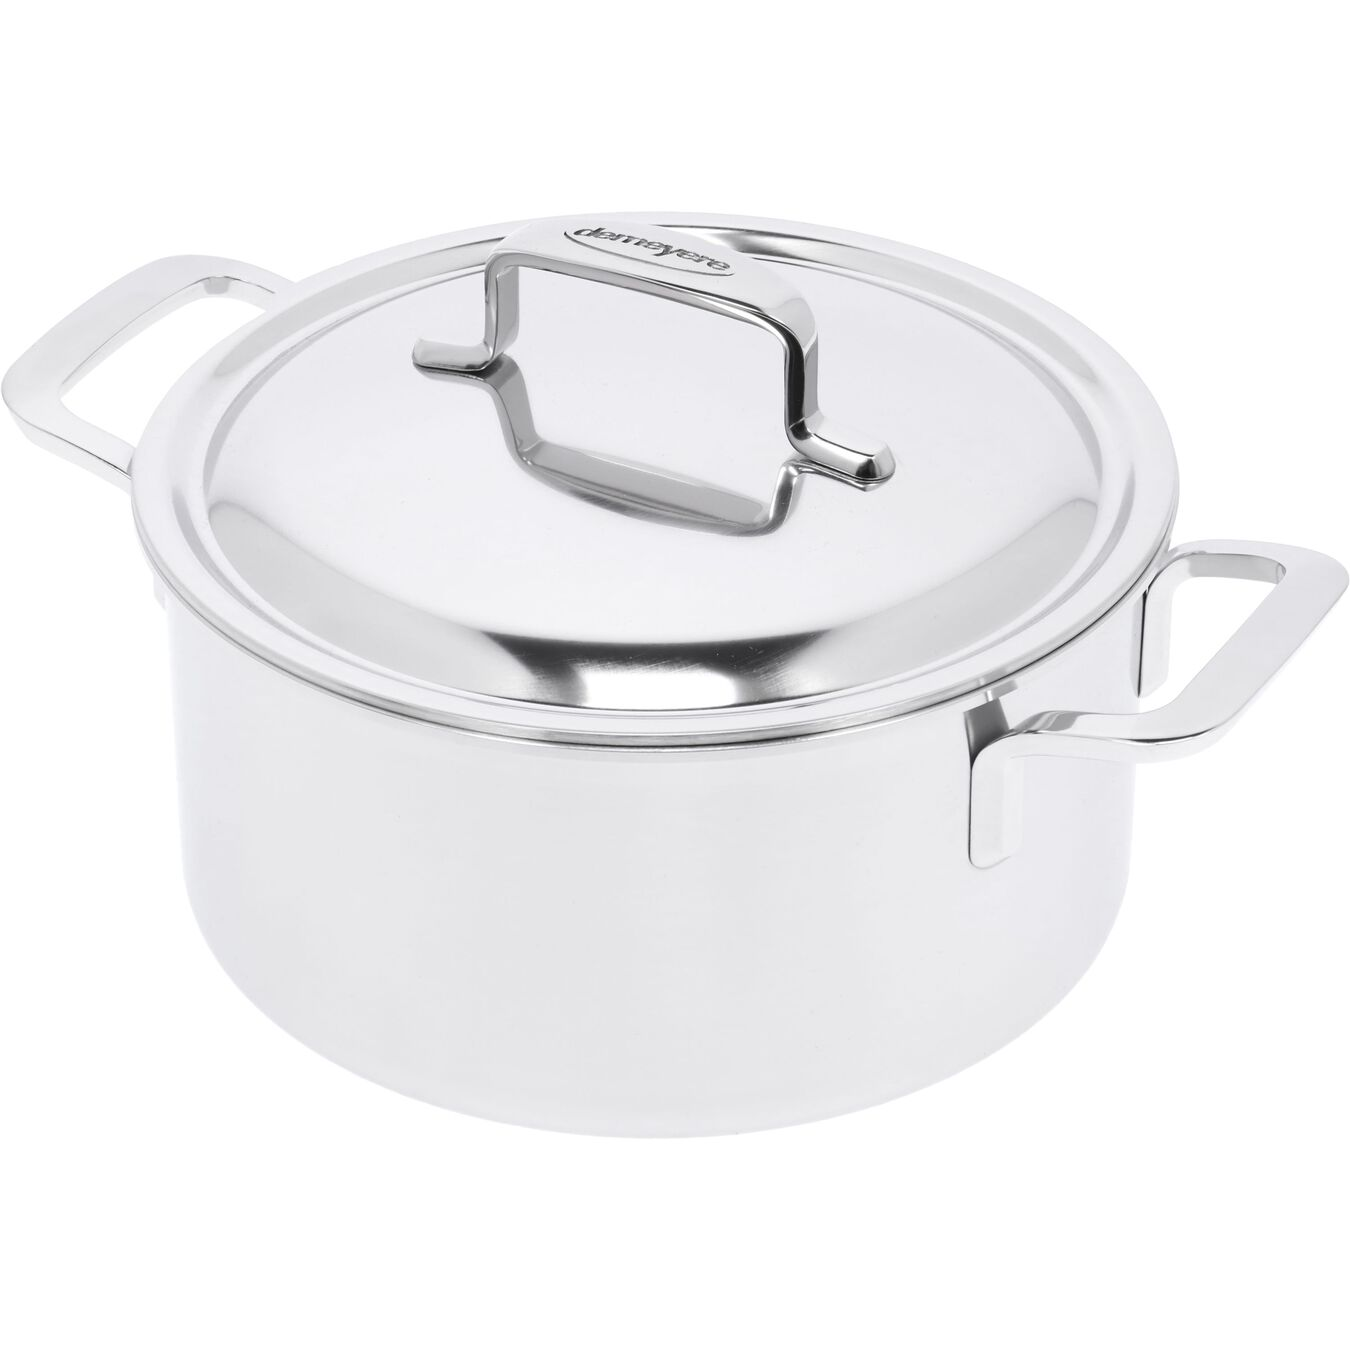 Kookpot met dubbelwandig deksel, 22 cm / 4 l,,large 6